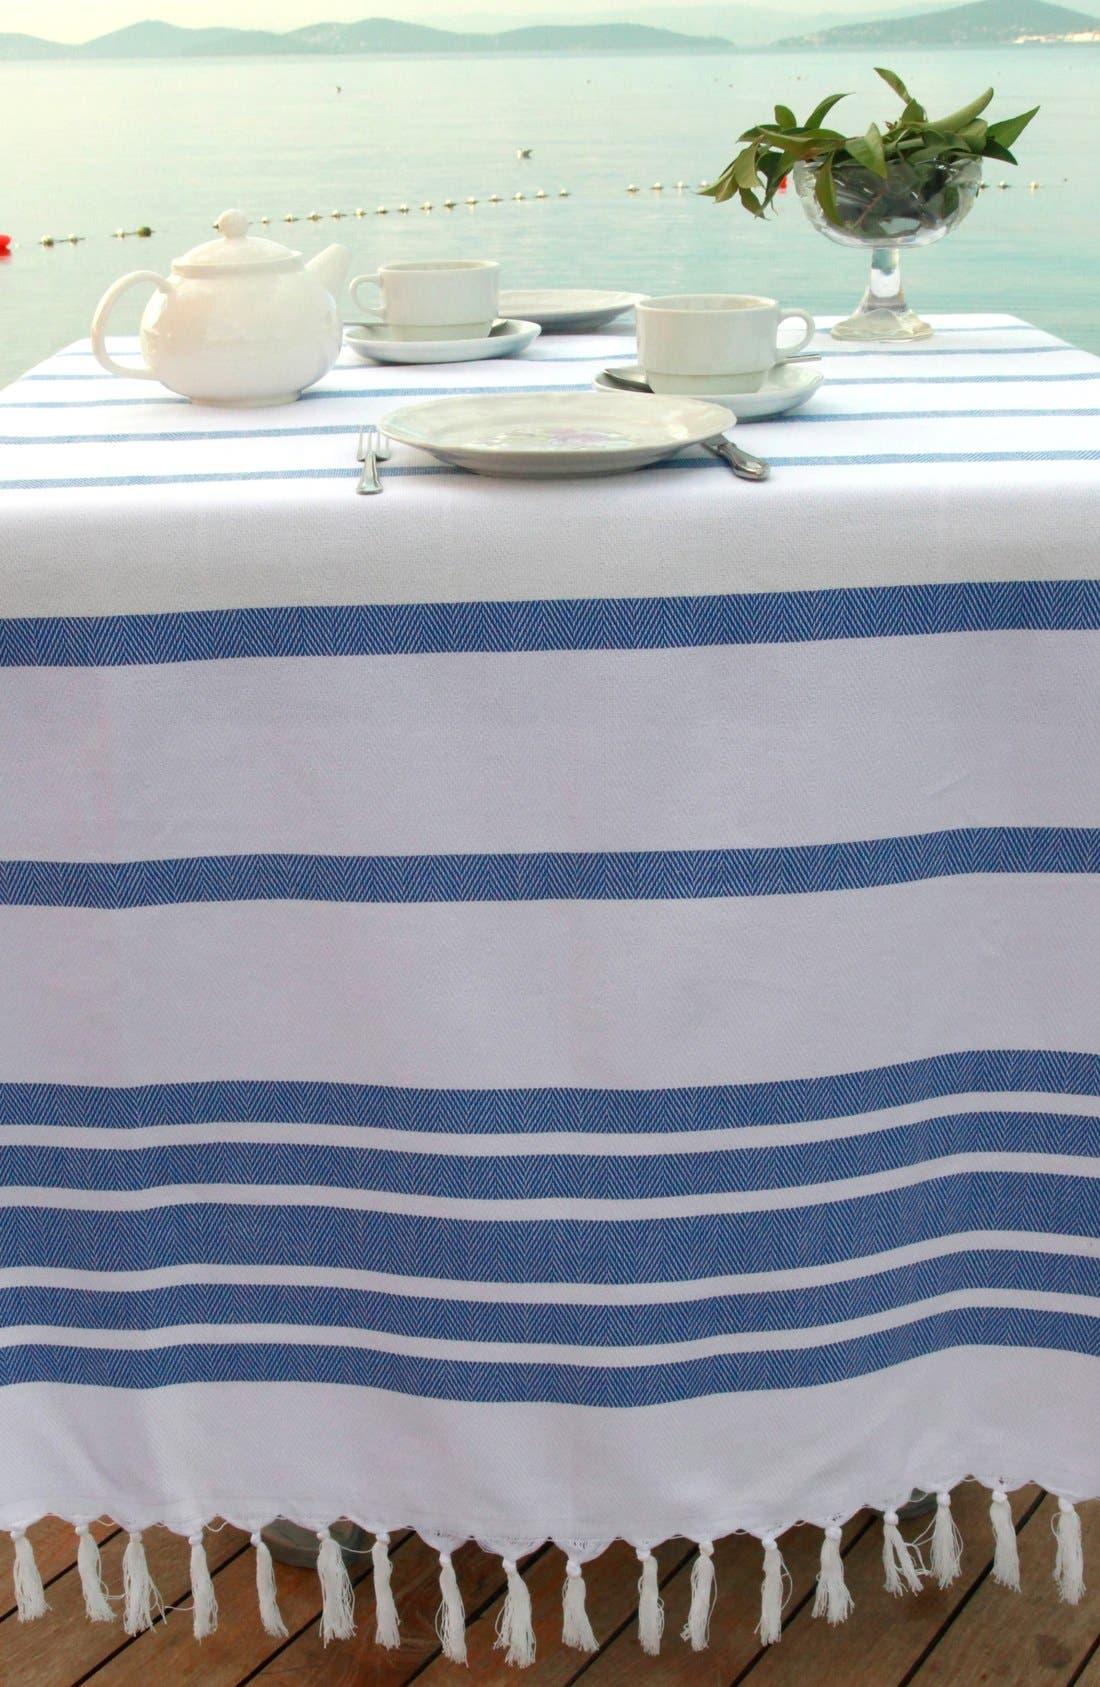 Herringbone Striped Turkish Pestemal Towel,                             Alternate thumbnail 4, color,                             Royal Blue/ White